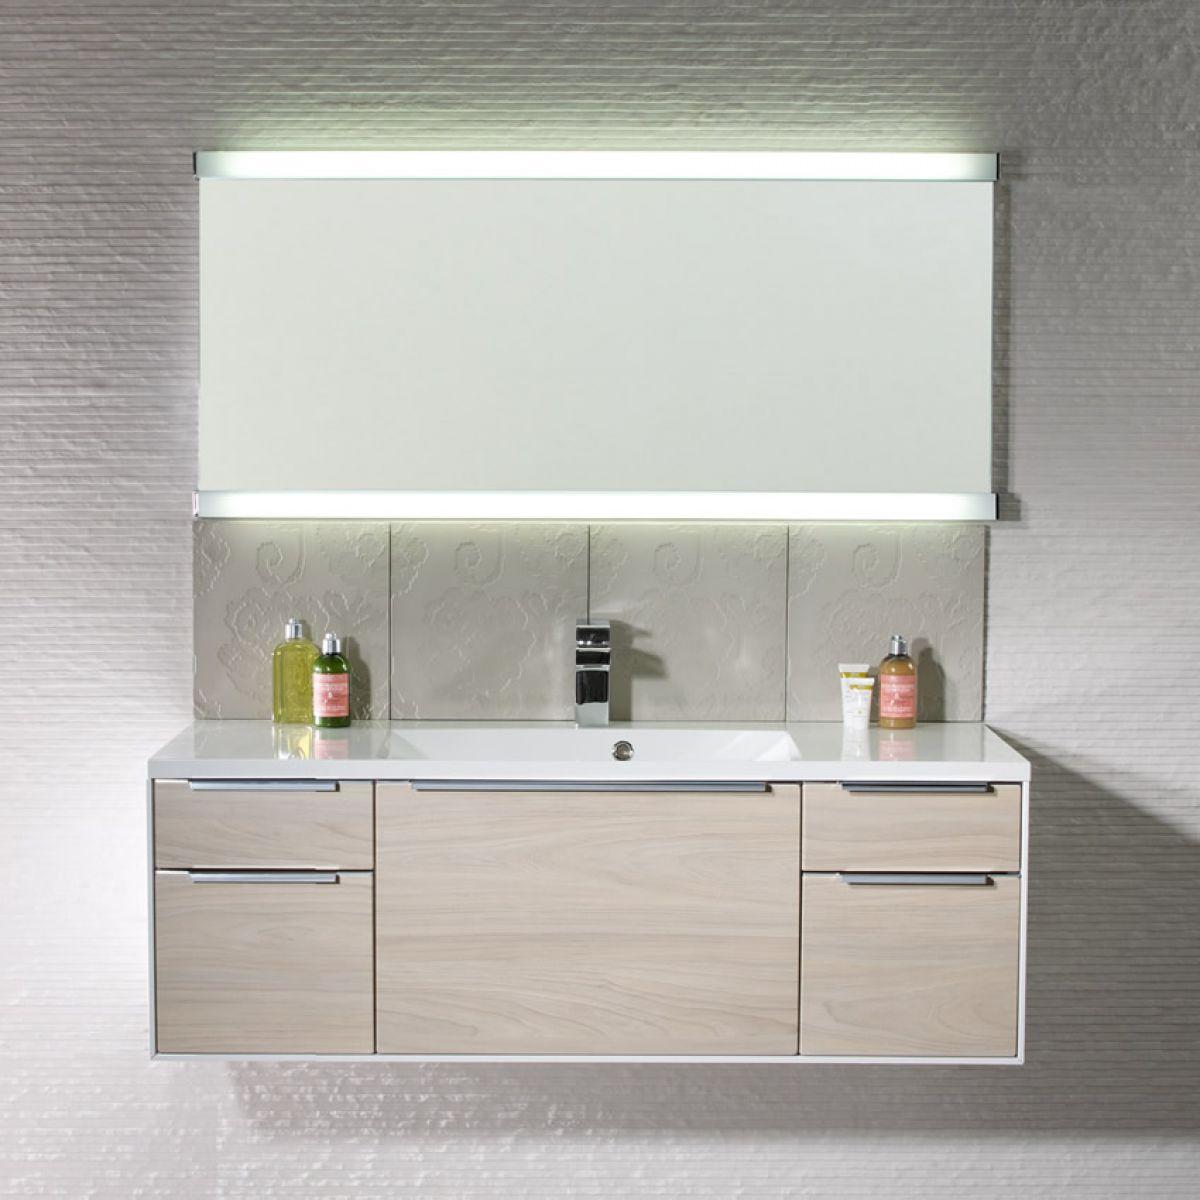 Roper Rhodes Transcend Illuminated Bathroom Mirror Uk Bathrooms